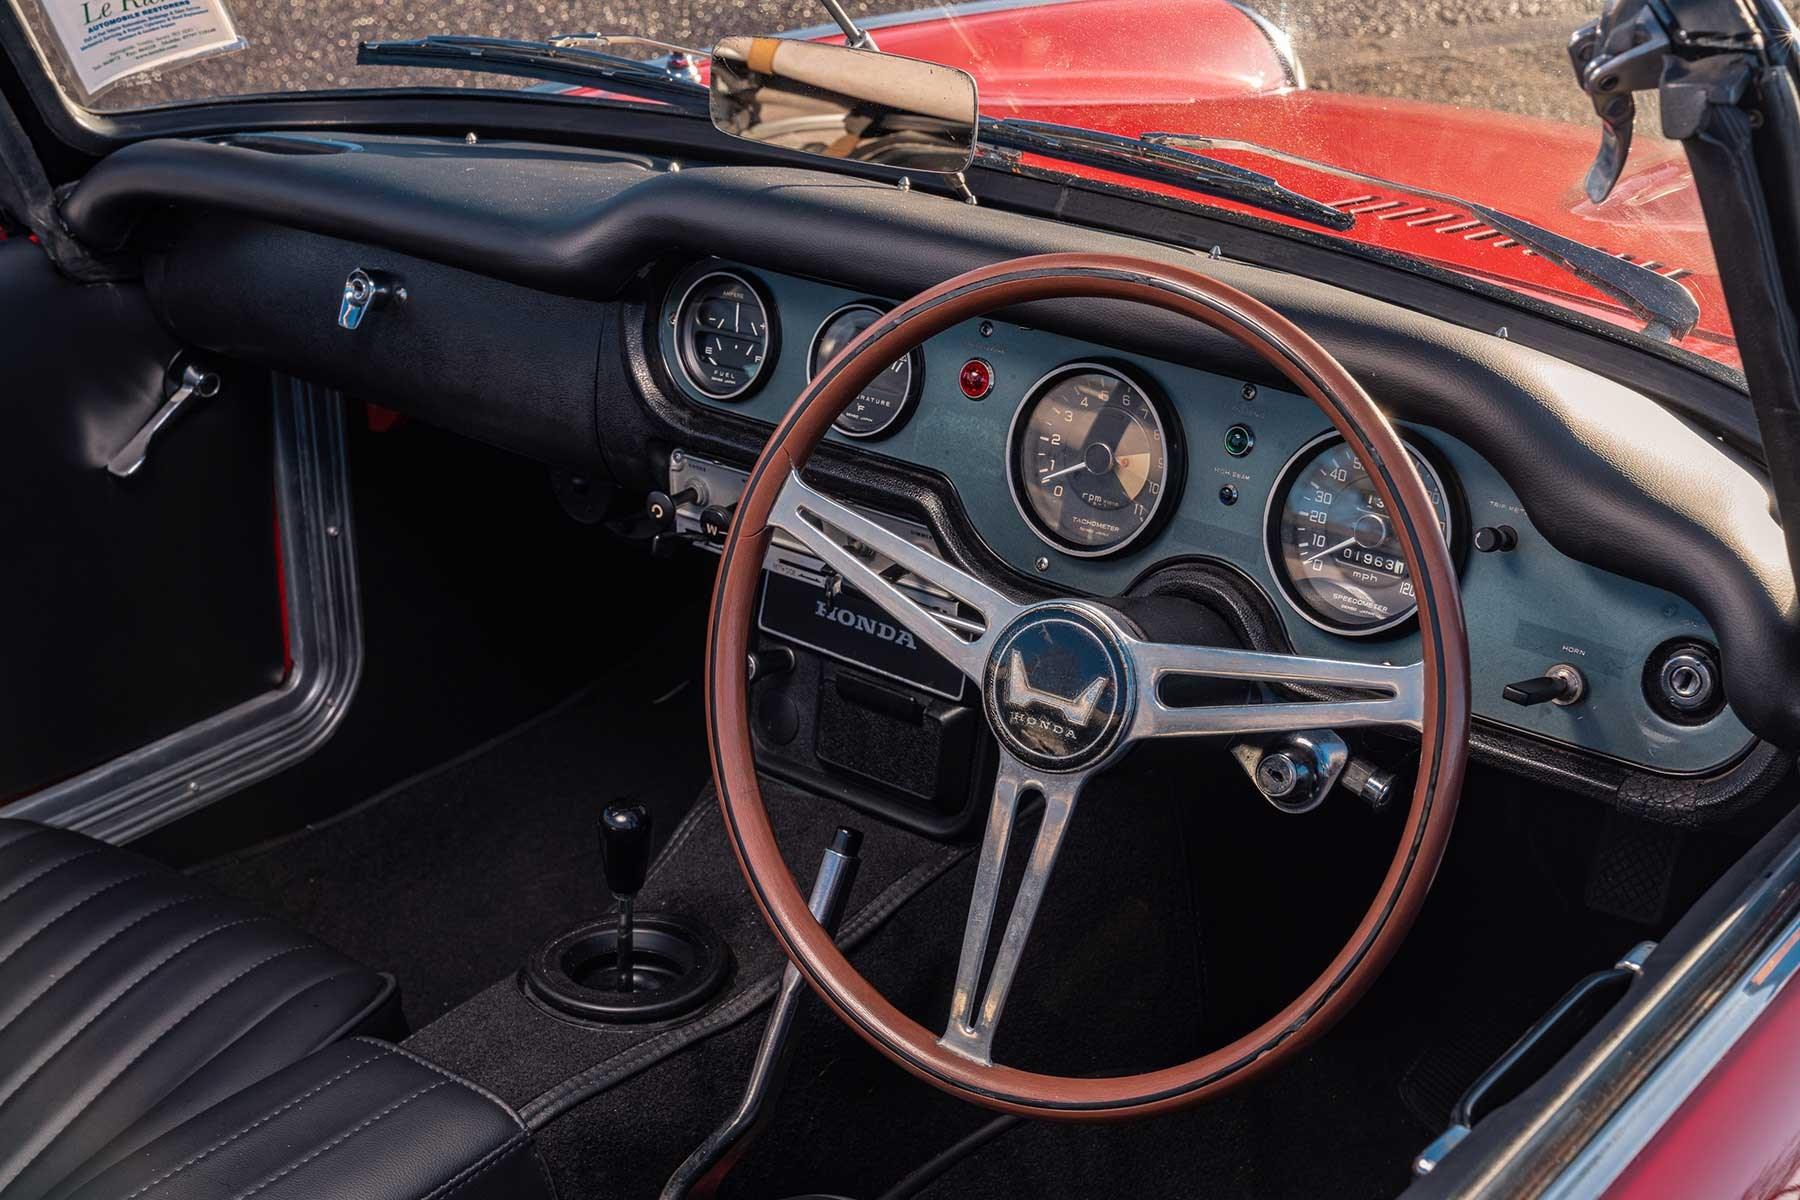 Honda S800 interior